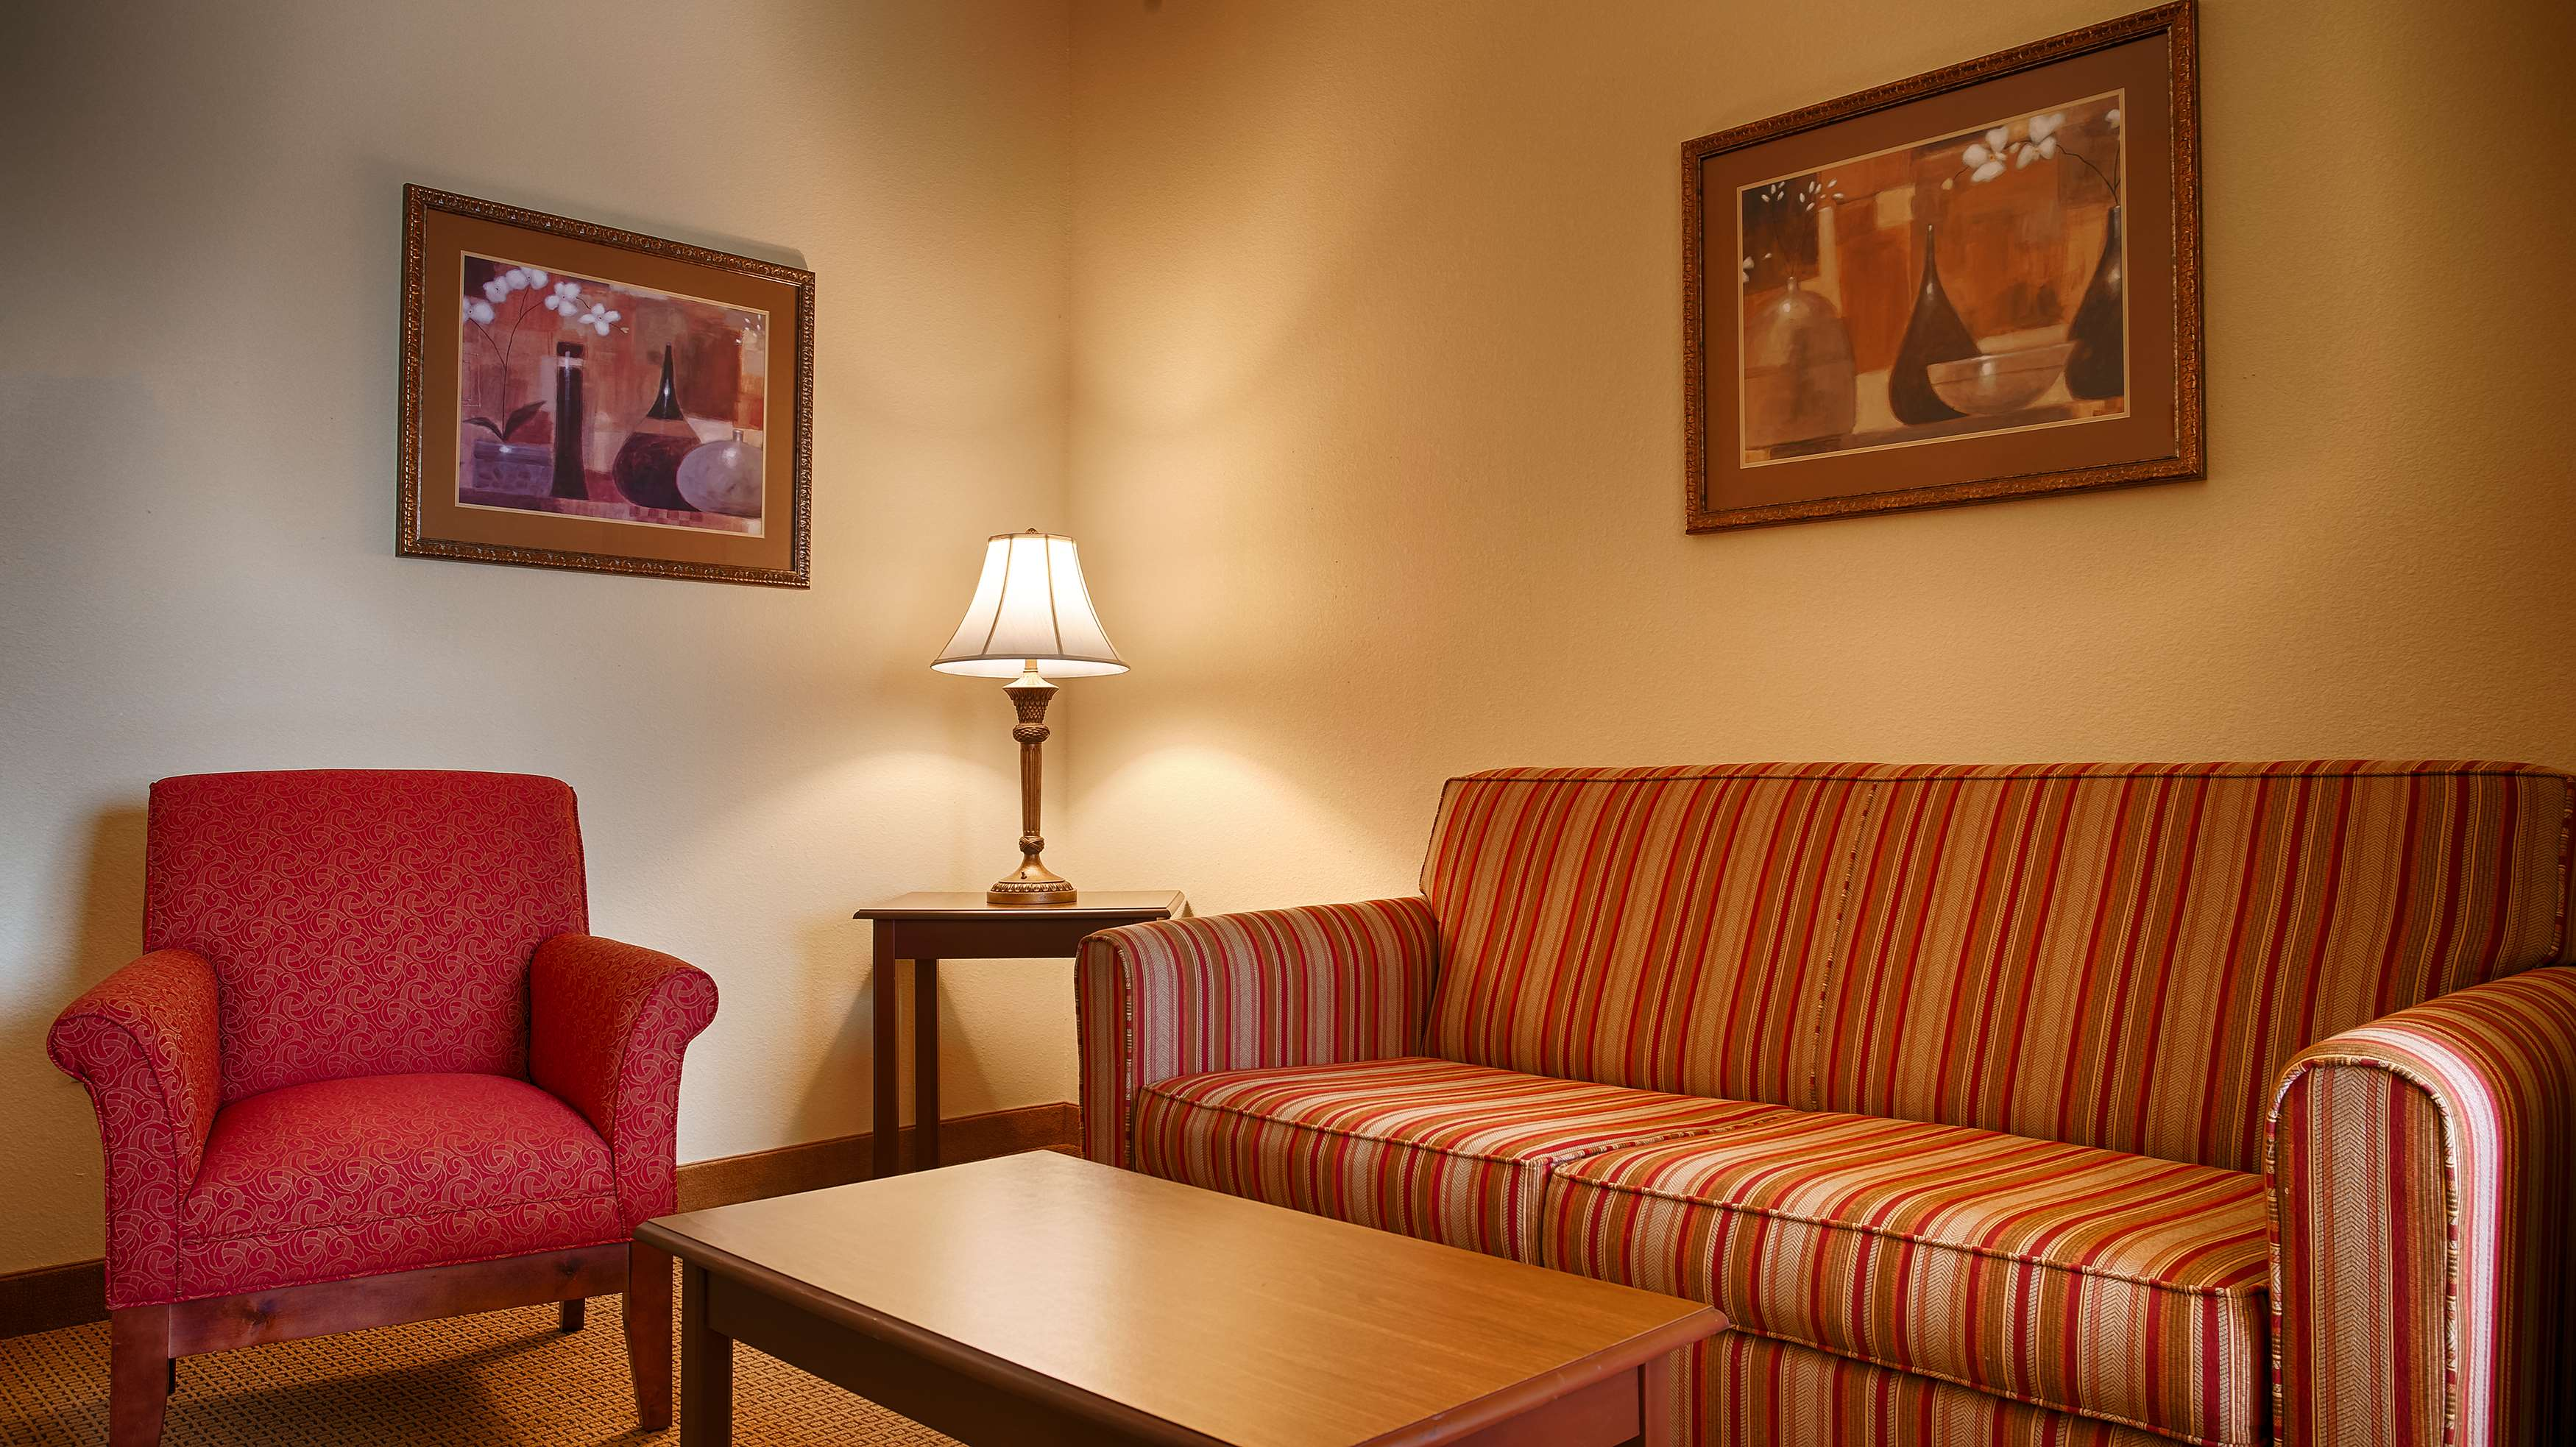 Best Western Littlefield Inn & Suites image 10